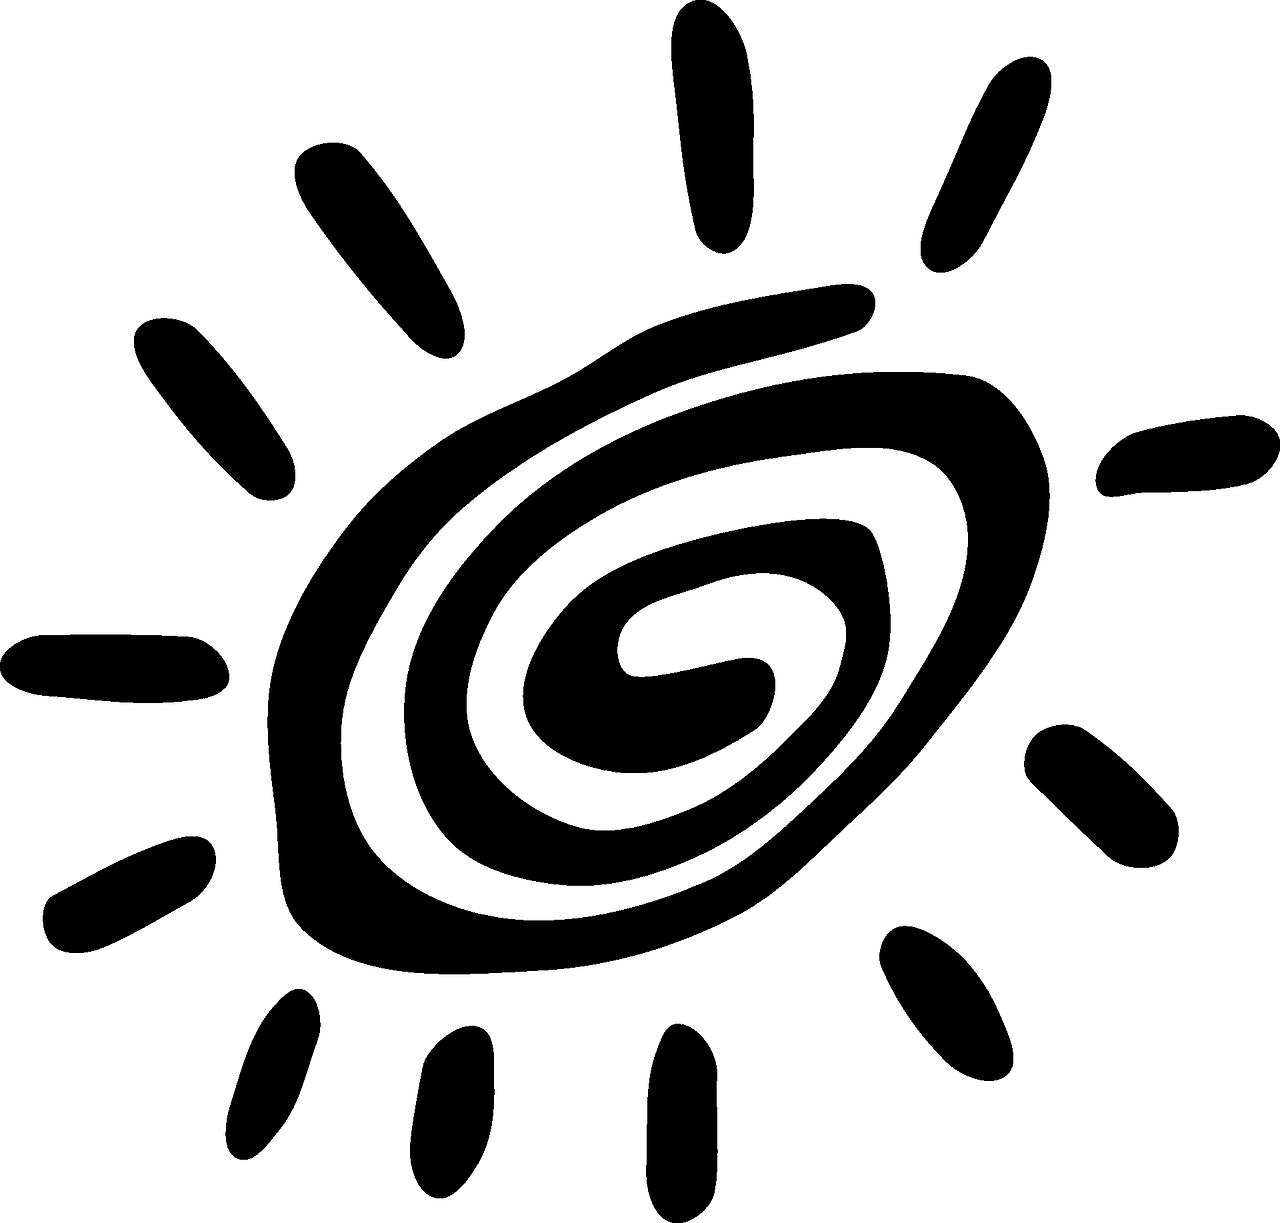 Sun tribal. Vacation petroglyph primitive spiral